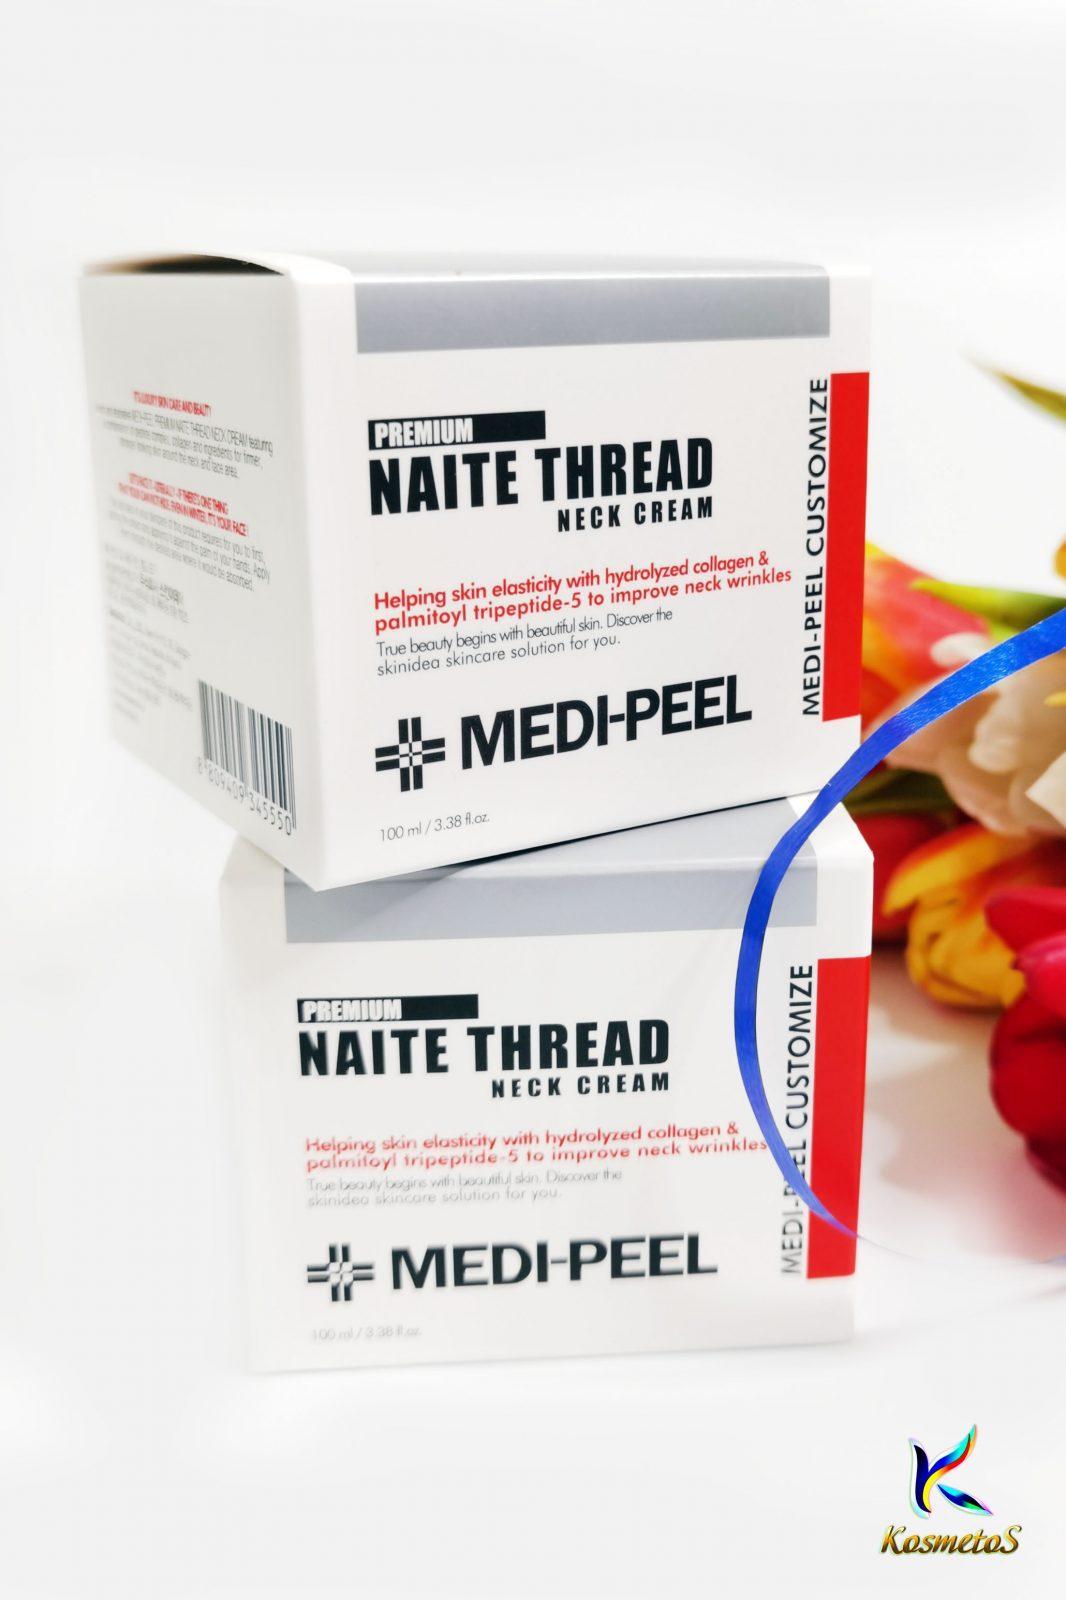 Medi Peel Naite Thread Neck Cream 100ml